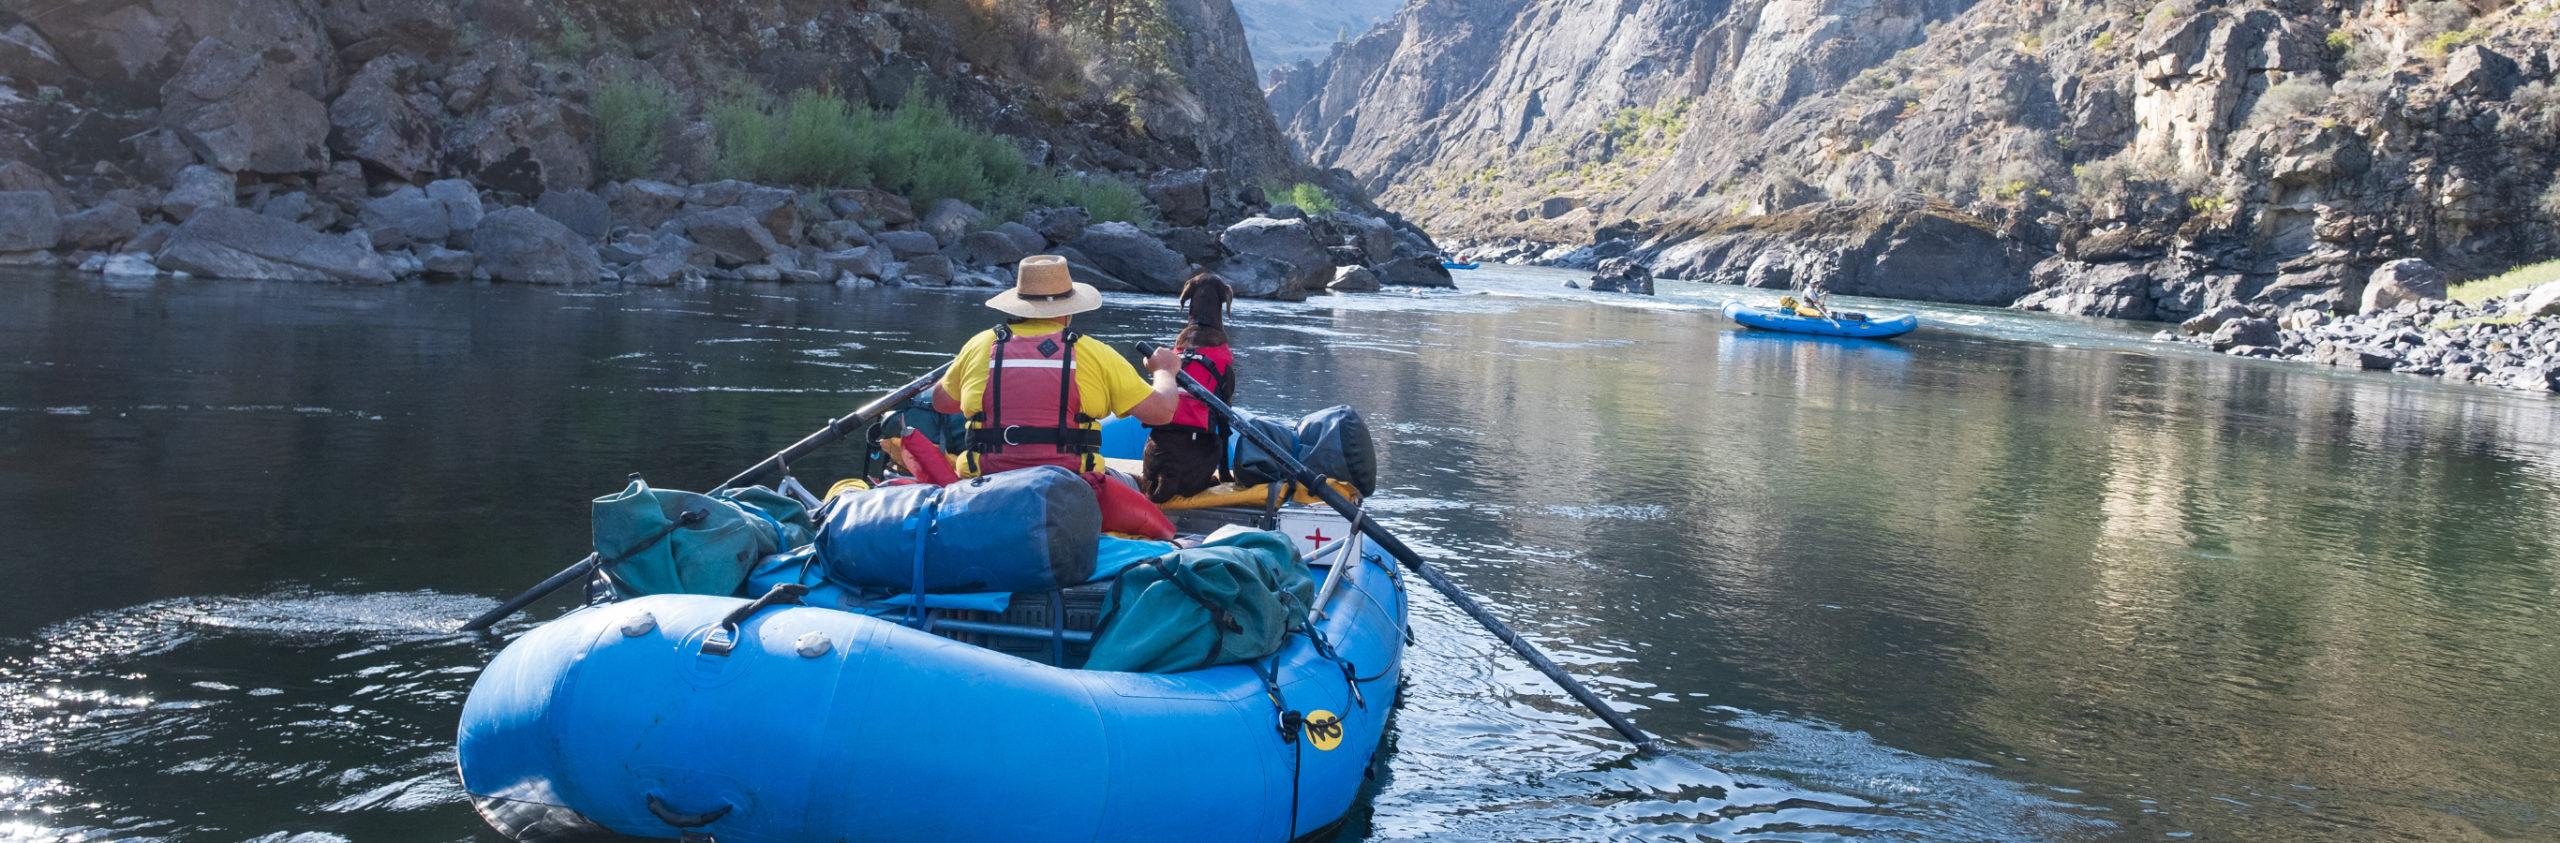 lower salmon river rafting